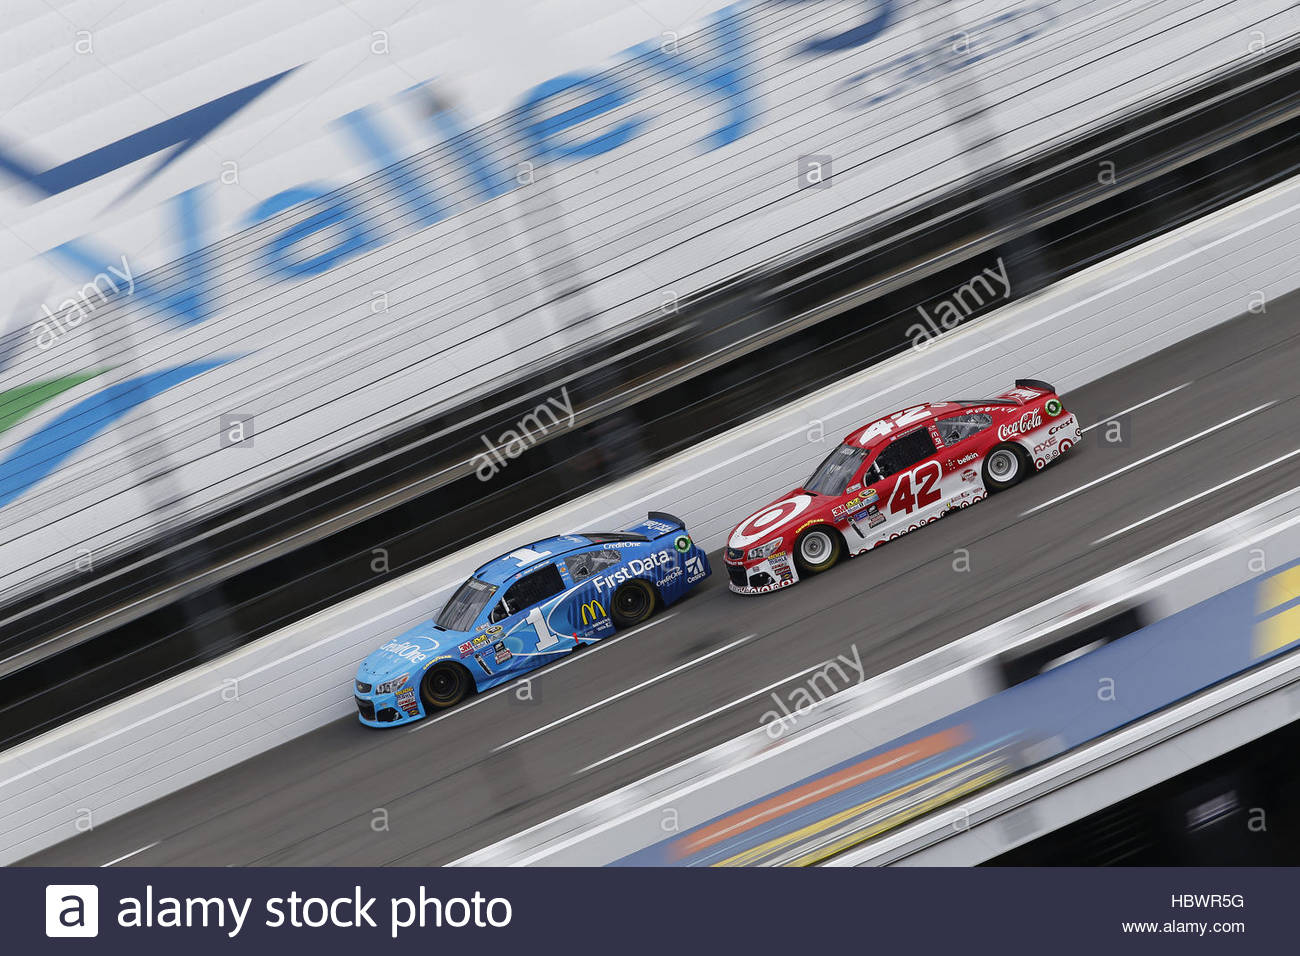 NASCAR: Ott 30 Goody rapido sollievo 500 Immagini Stock